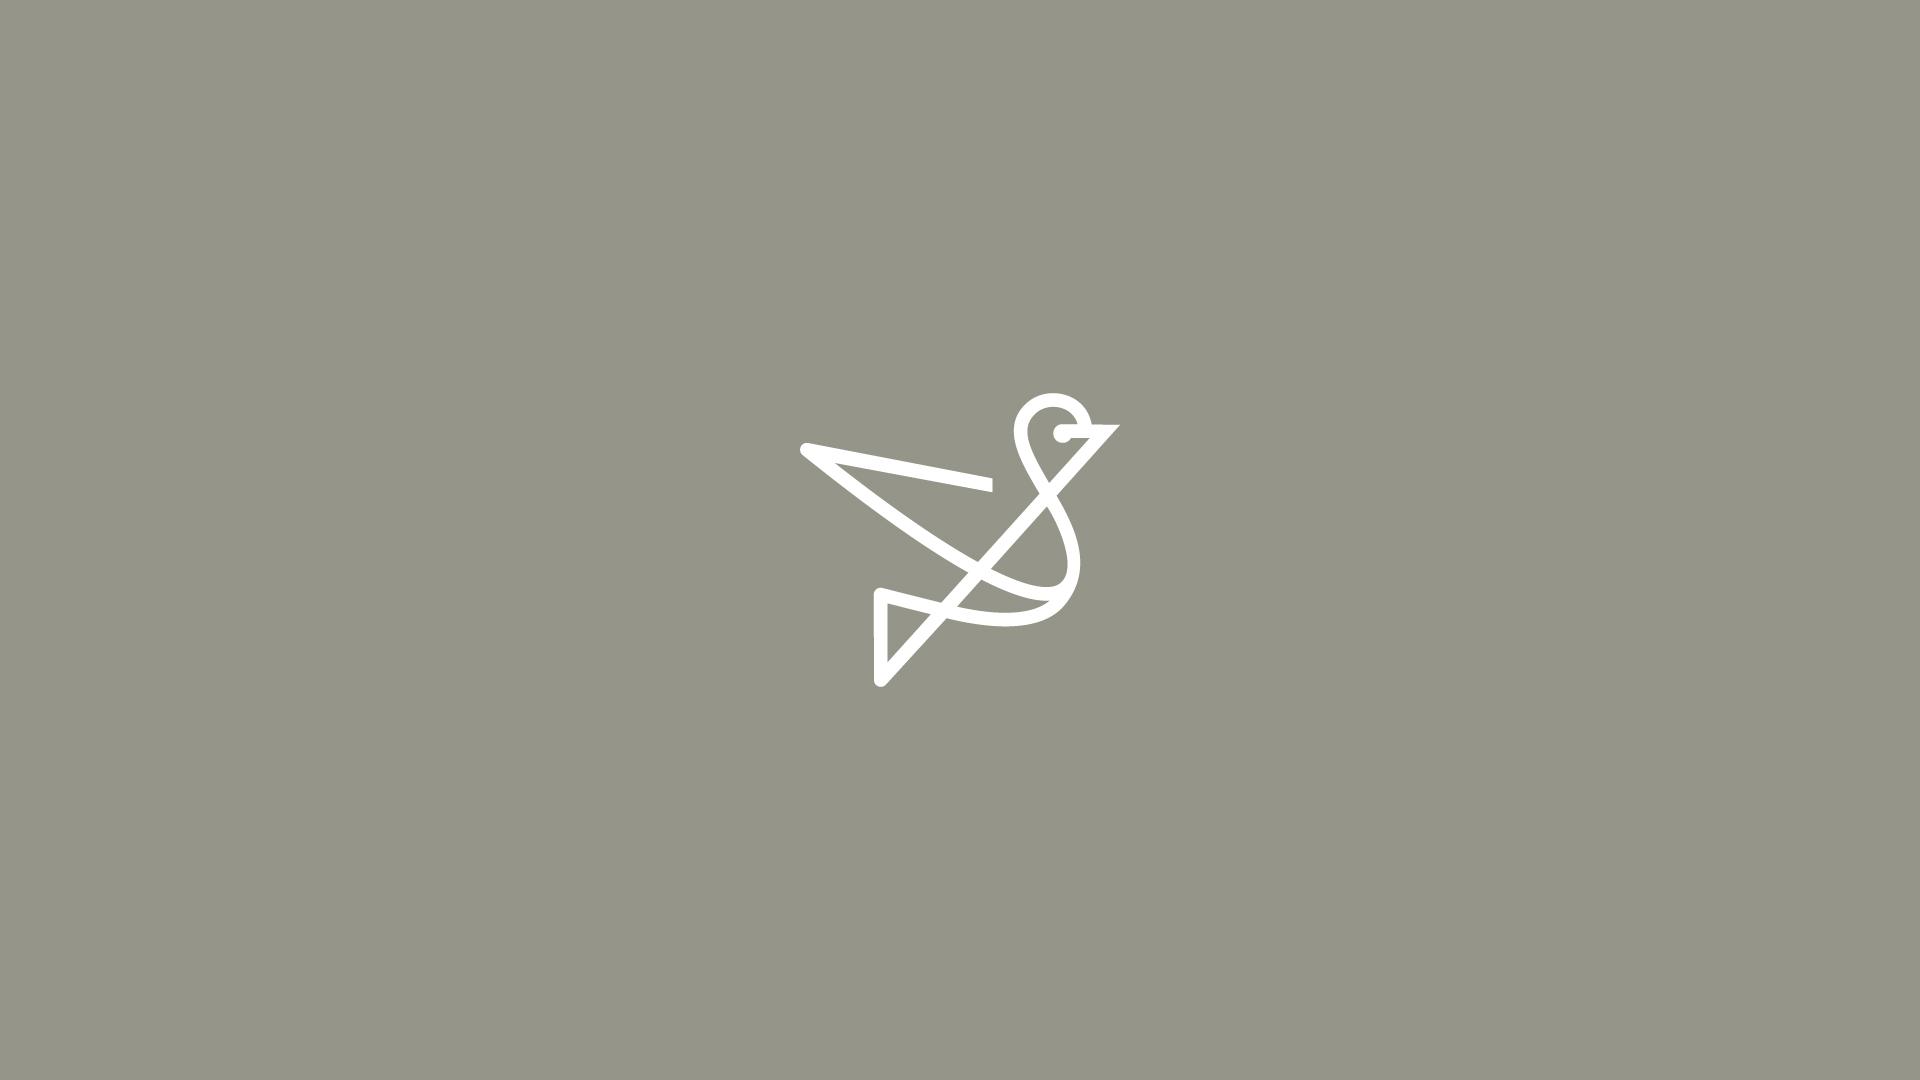 Art & creative bird logo